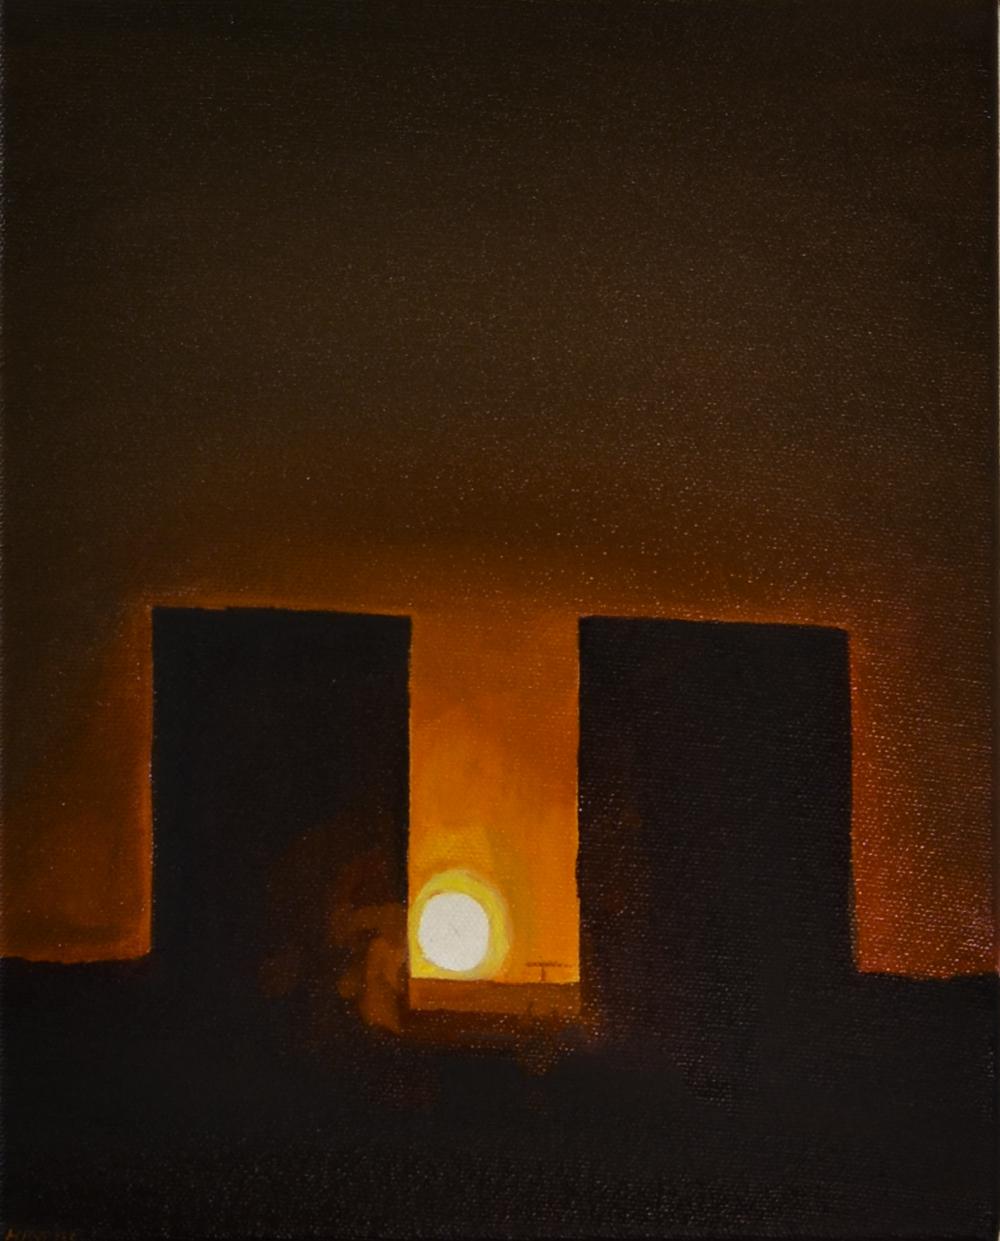 Tower block, night lights, henry byrne